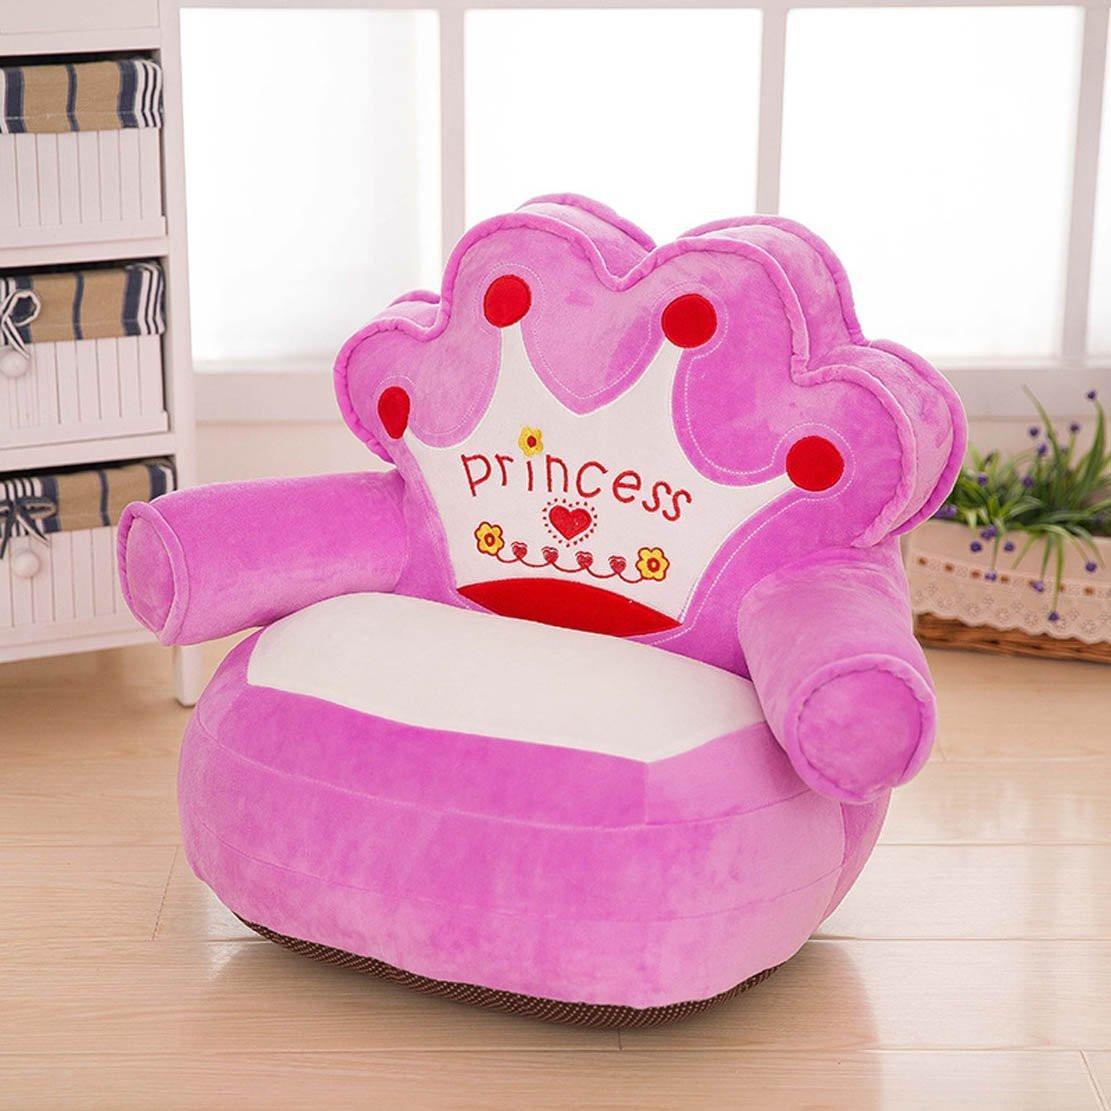 1 Yr Old Girl Birthday Gift Ideas  12 Best Birthday Gift Ideas for 1 Year Old Girl